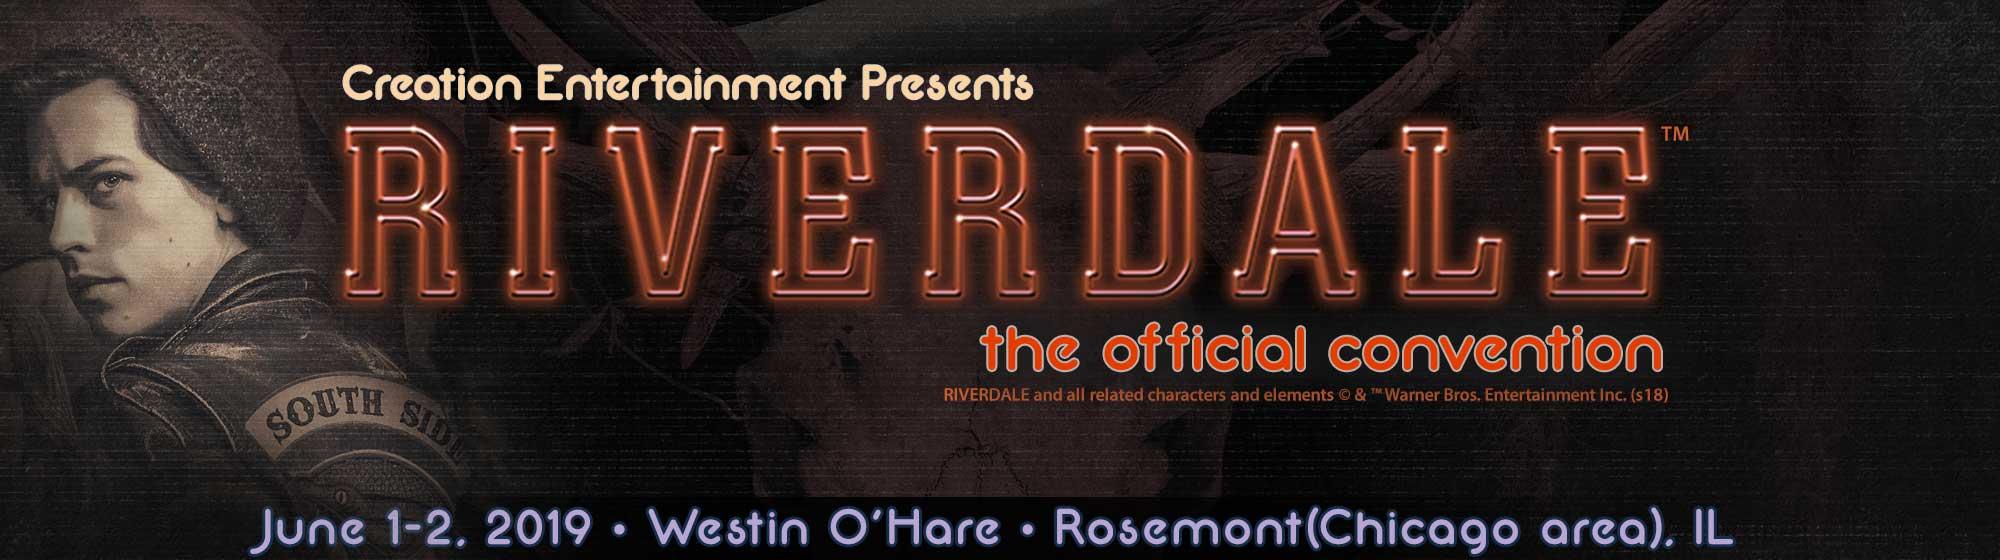 Riverdale Official Convention June 1-2, 2019